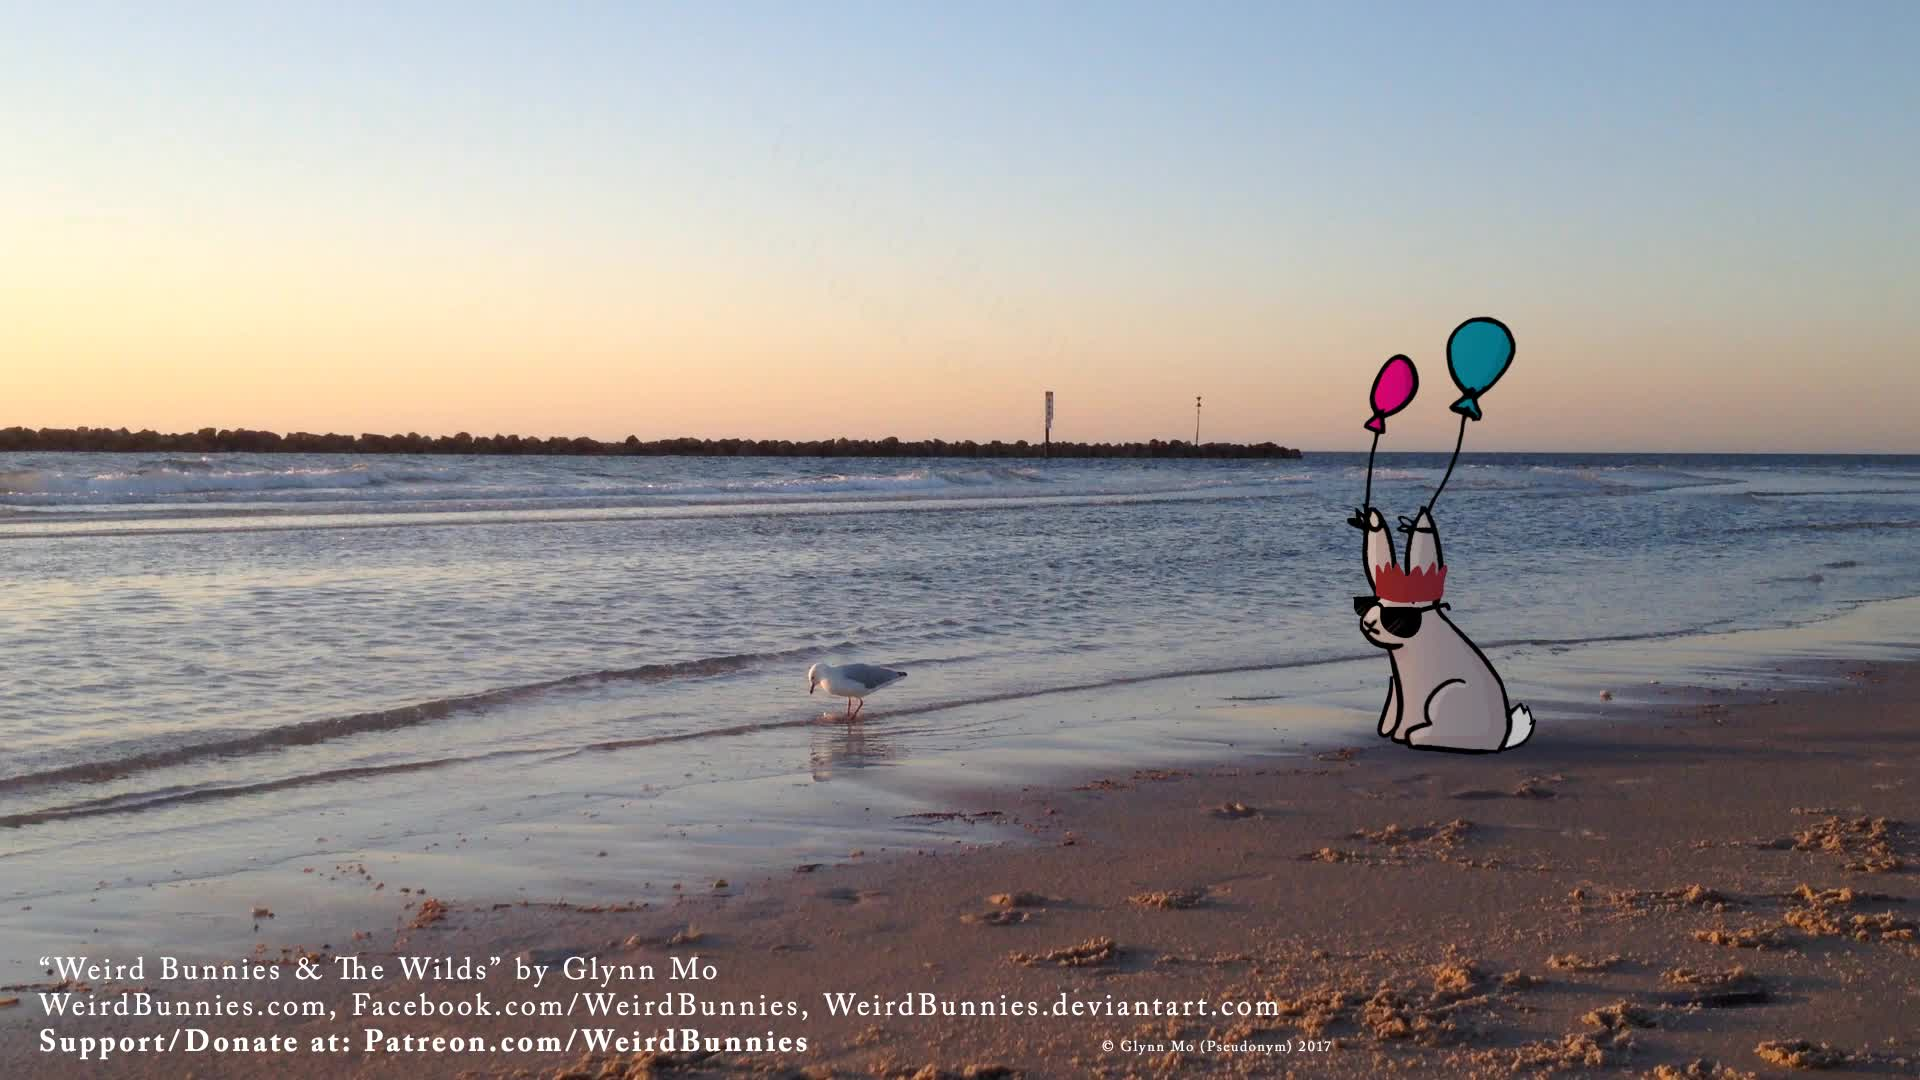 Balloon, Beach, Bird, Birds, Bunnies, Bunny, Cute, Gull, Pretty, Sand, Sea, Seagull, Shore, Sunset, Taps, Tippy, Tippytaps, Water, Weird, WeirdBunnies, Balloon Bunny watches Seagull Tippy Taps GIFs